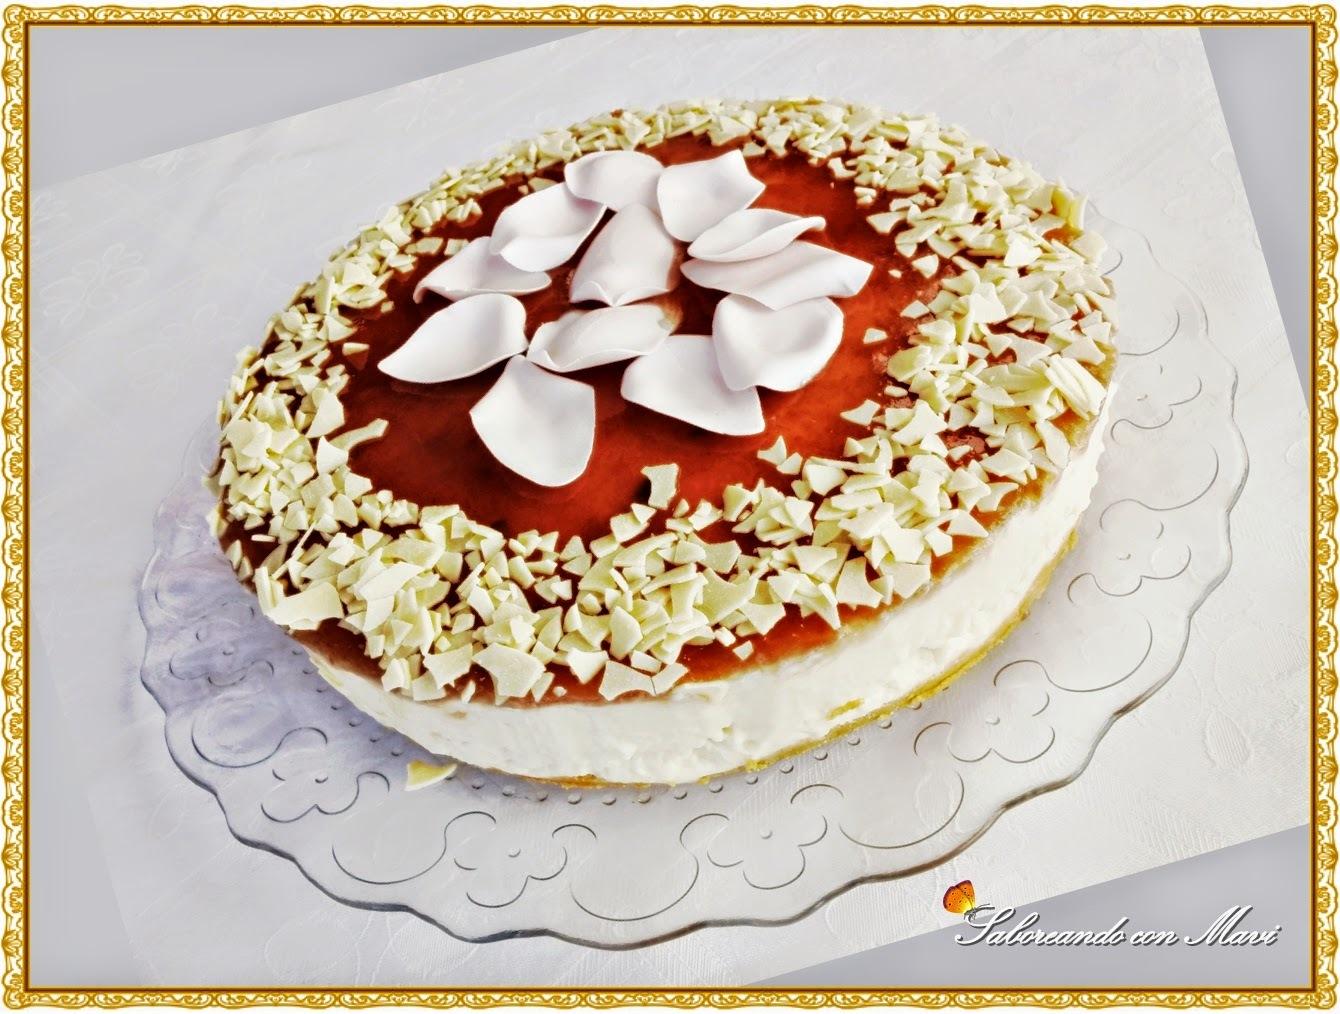 Mousse de chocolate blanco con mermelada de Pétalos de Rosas